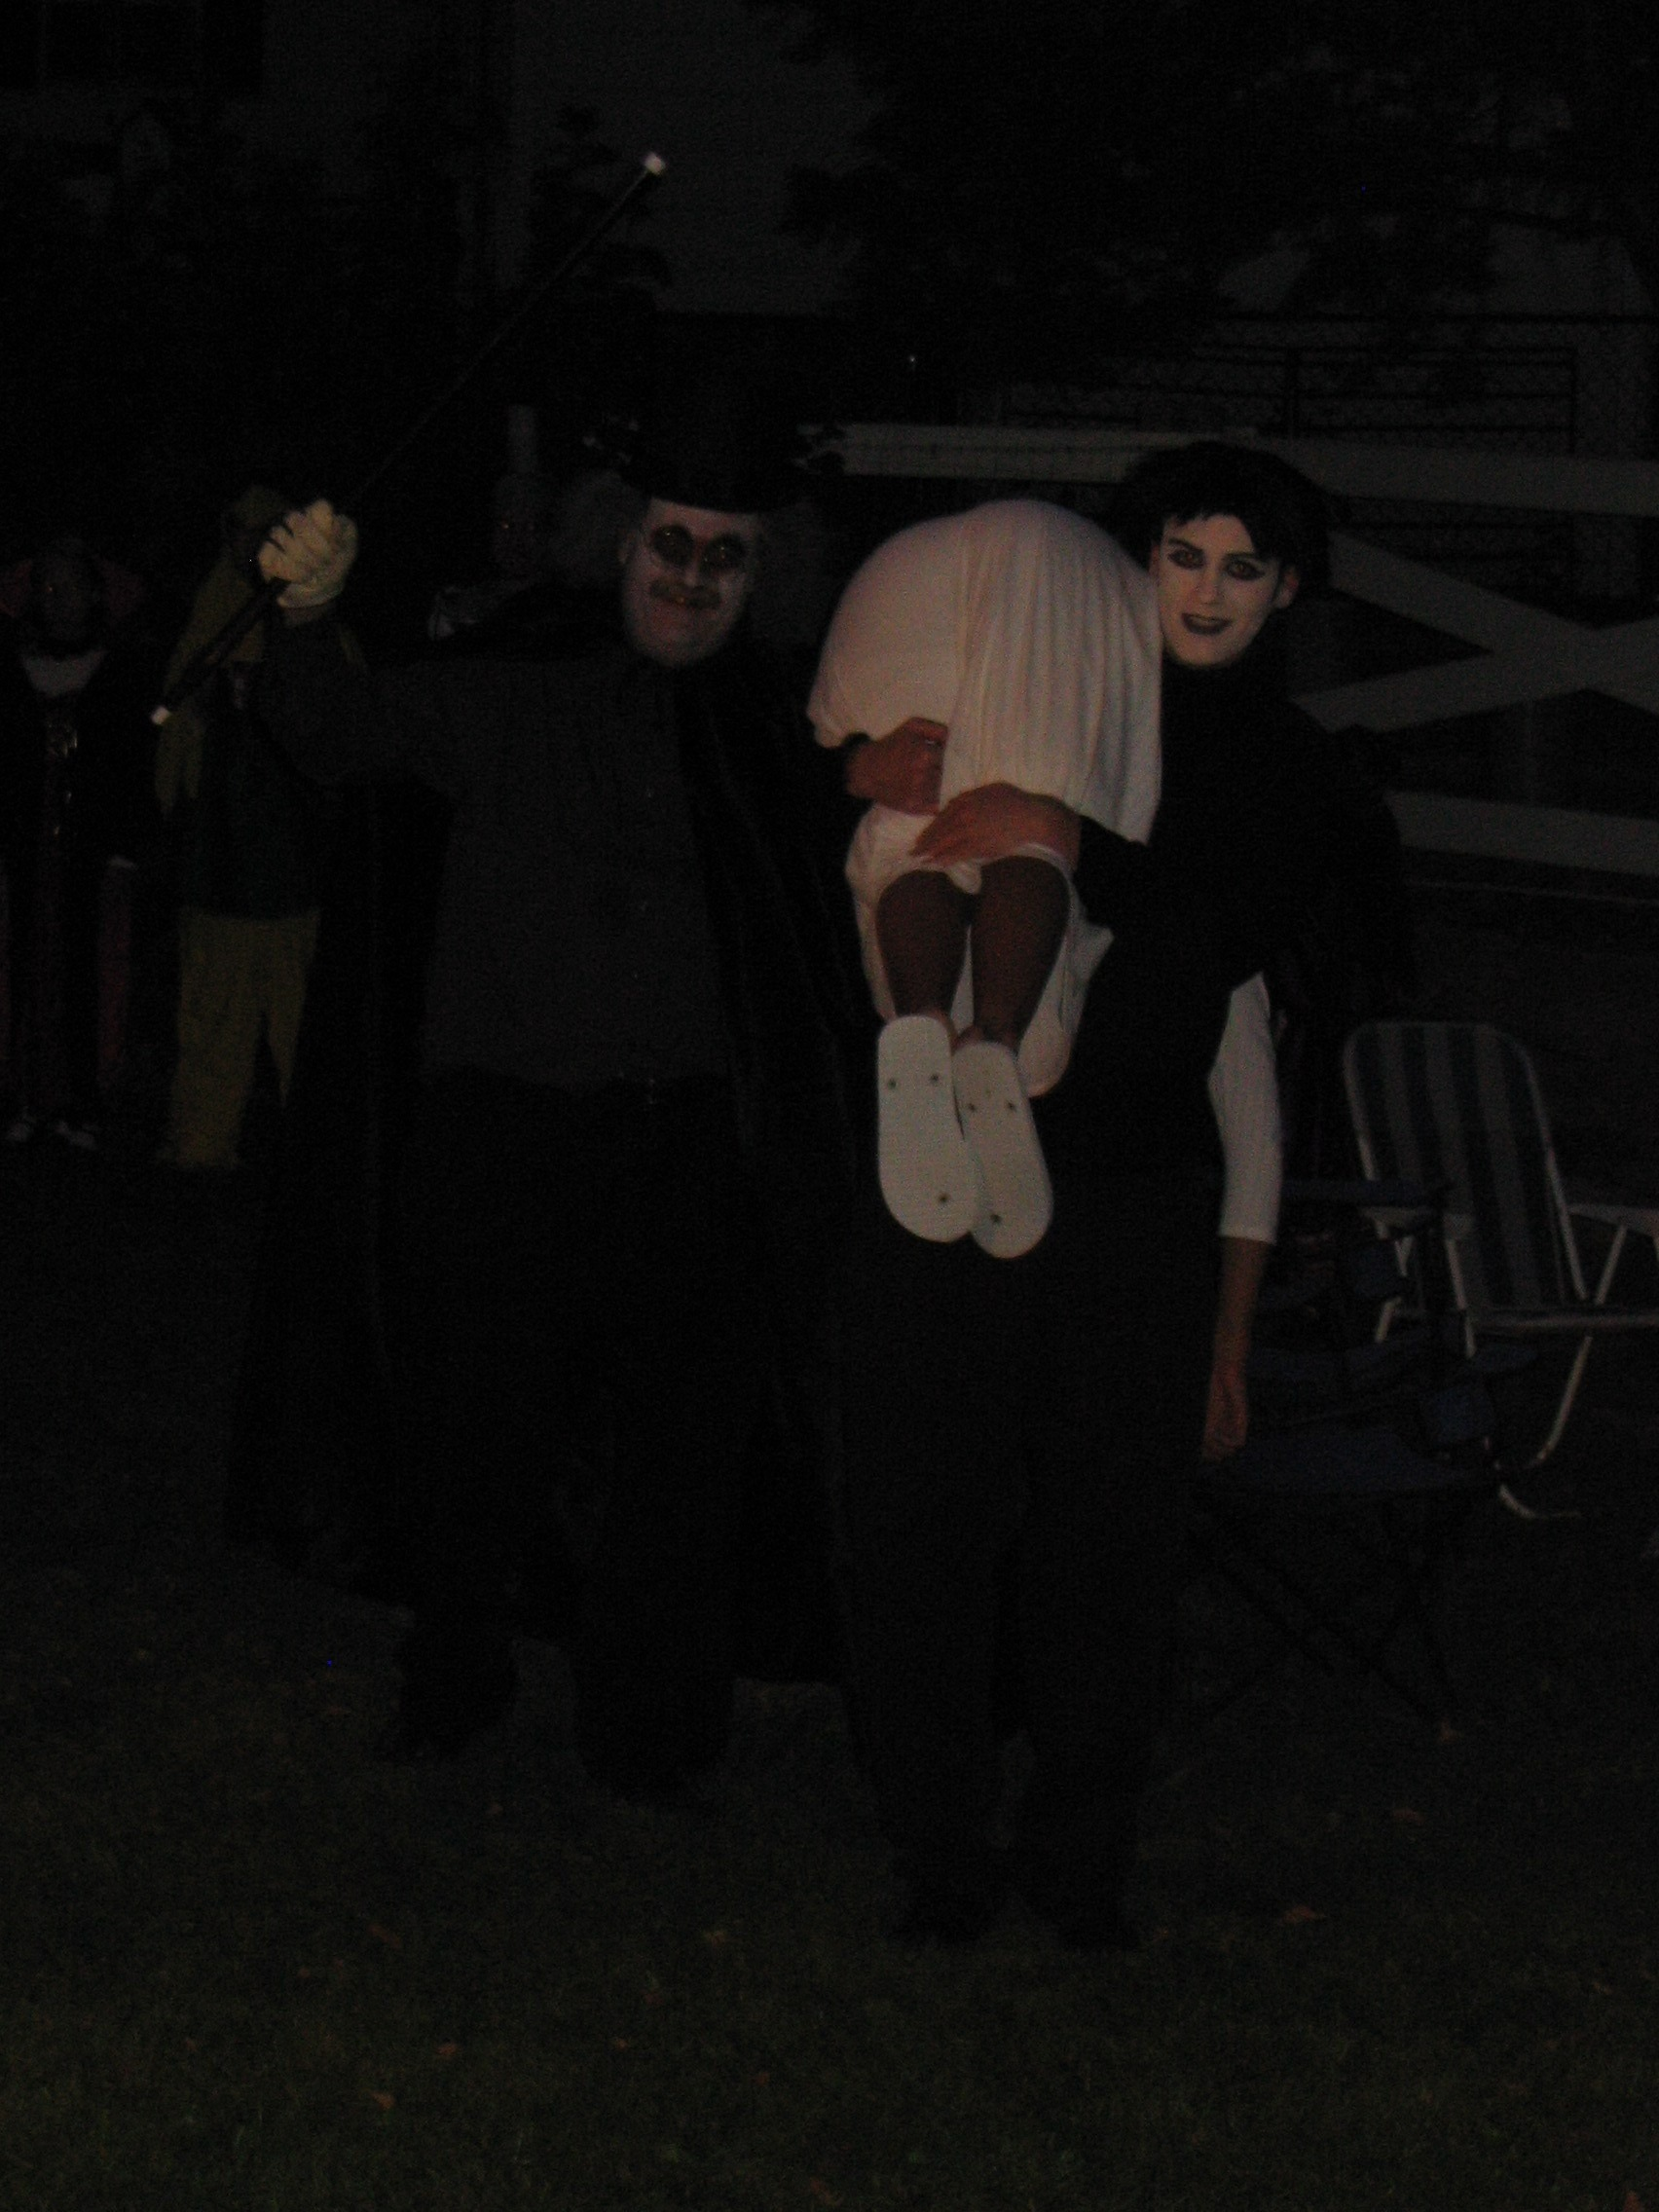 Halloween Party Oct 28 2006 Chemistry Club Chemistry